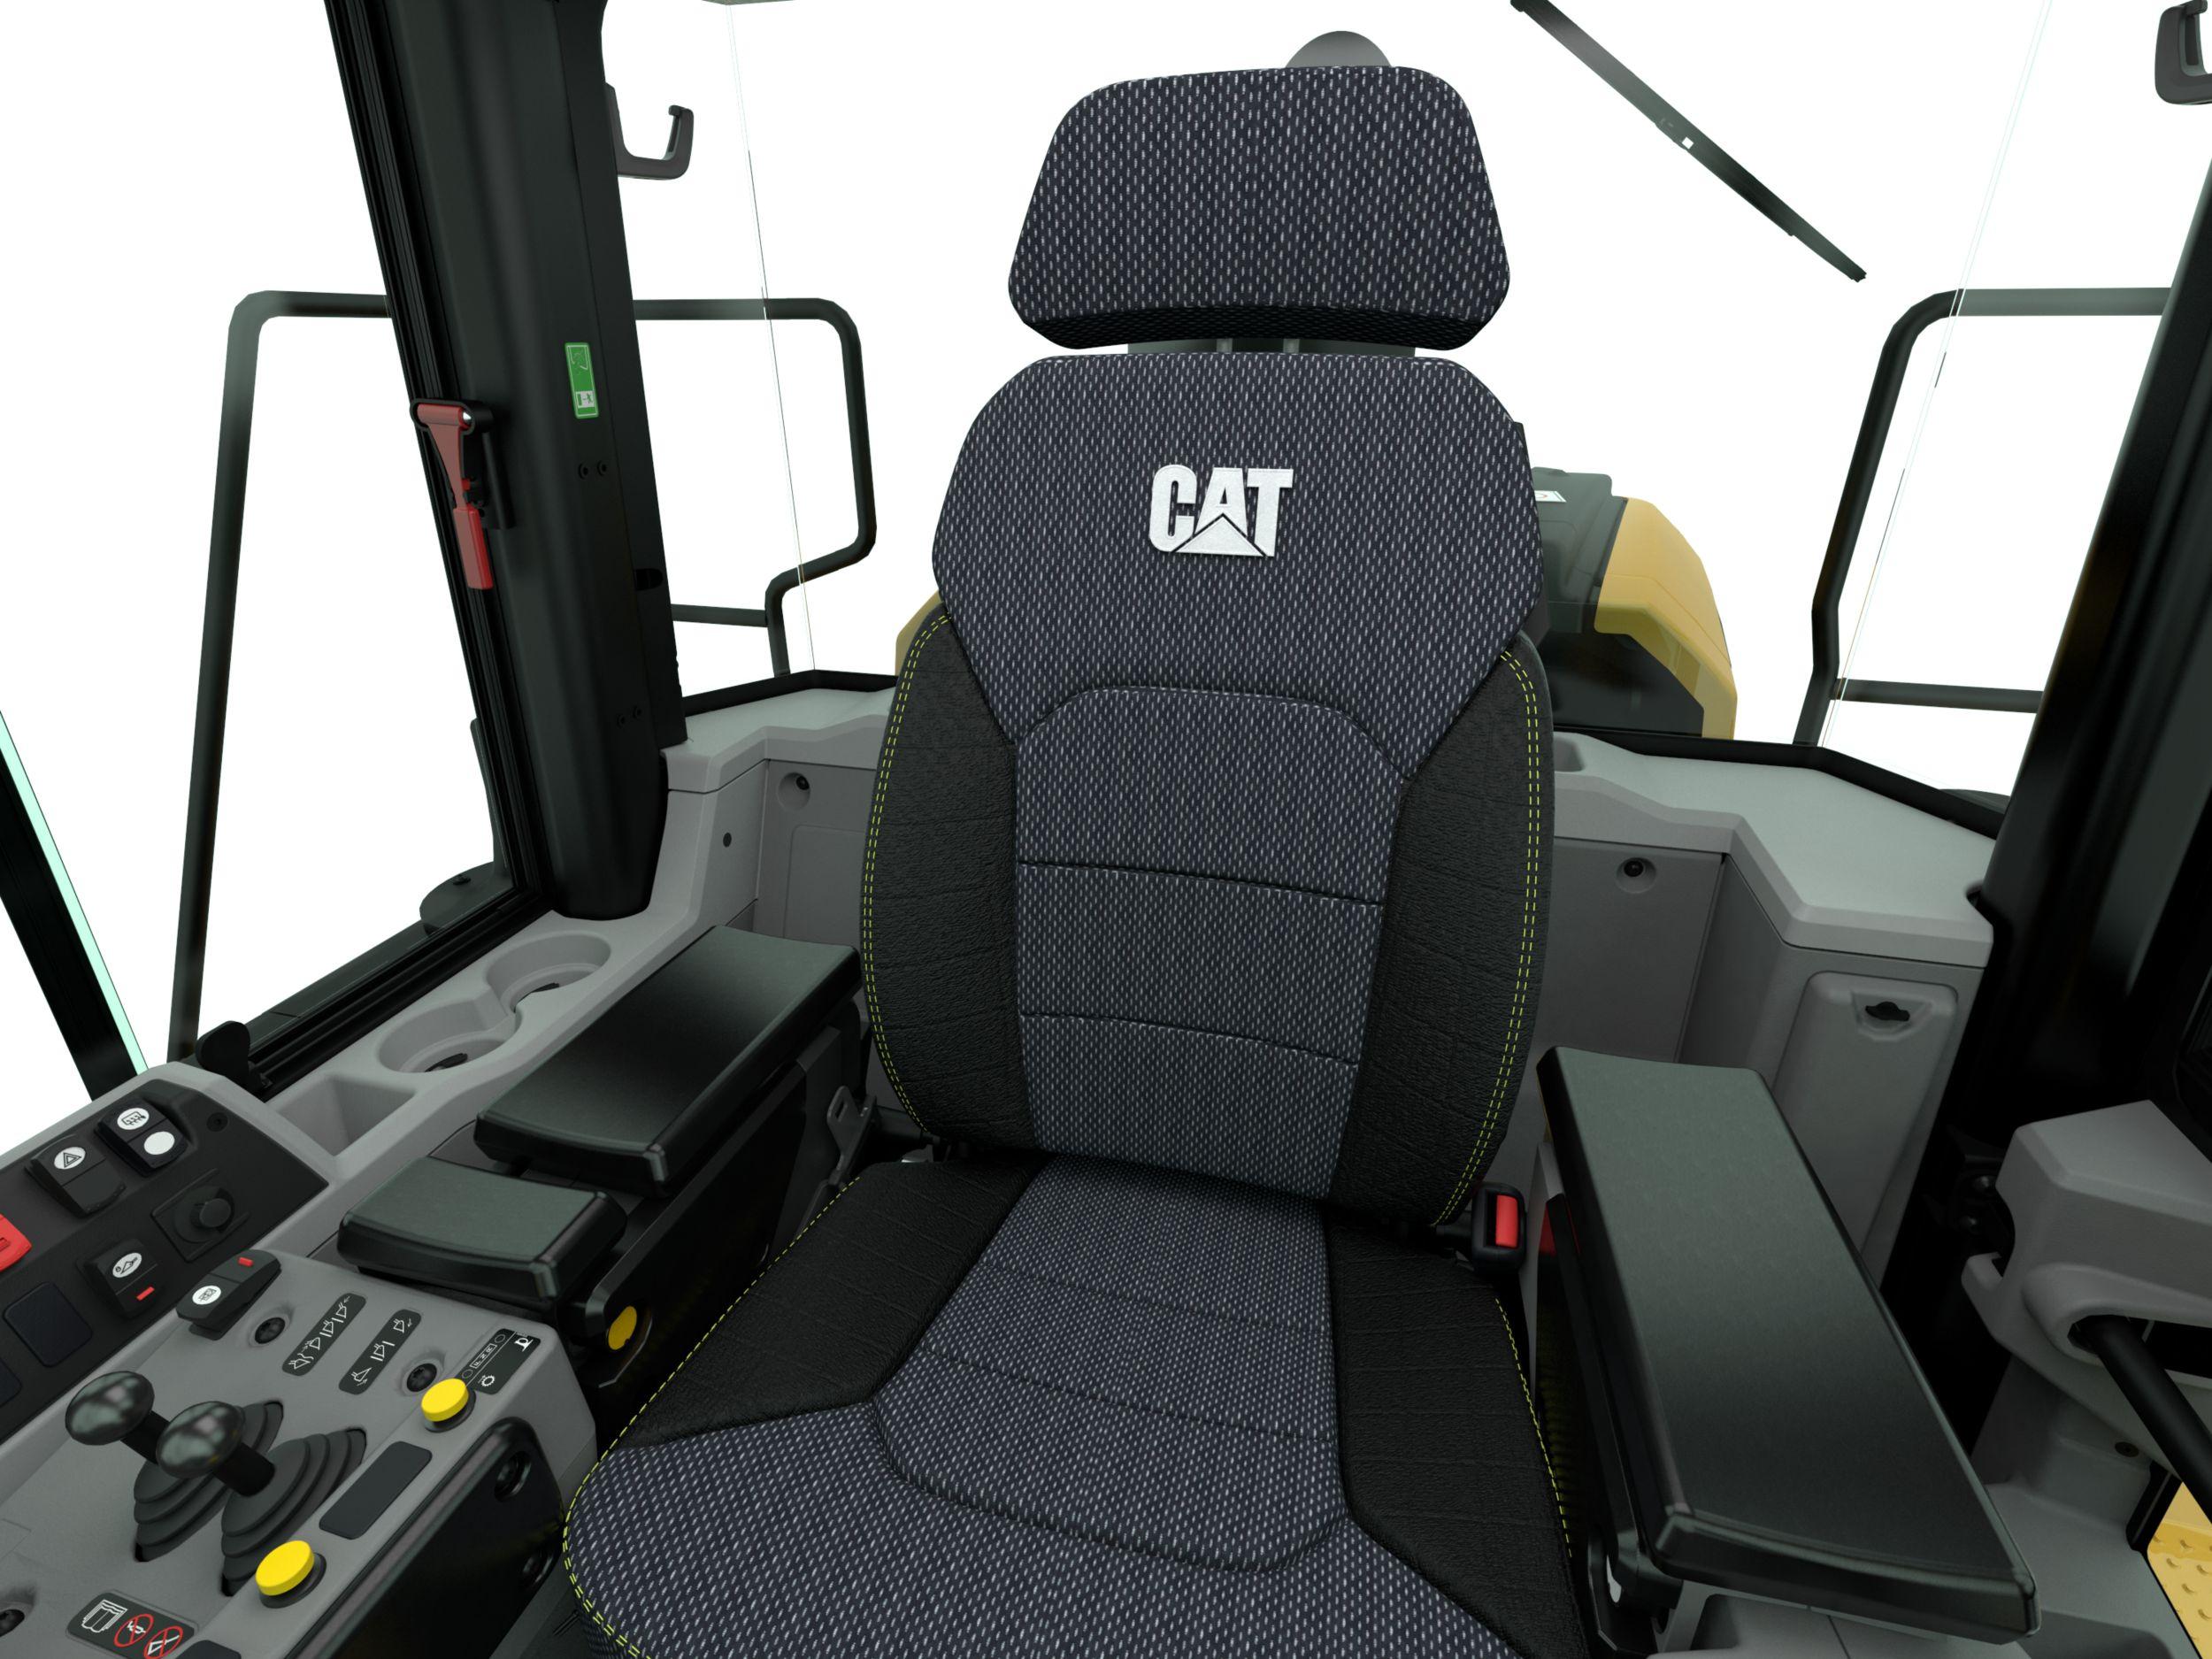 Cat M Series 2019 update, new seat